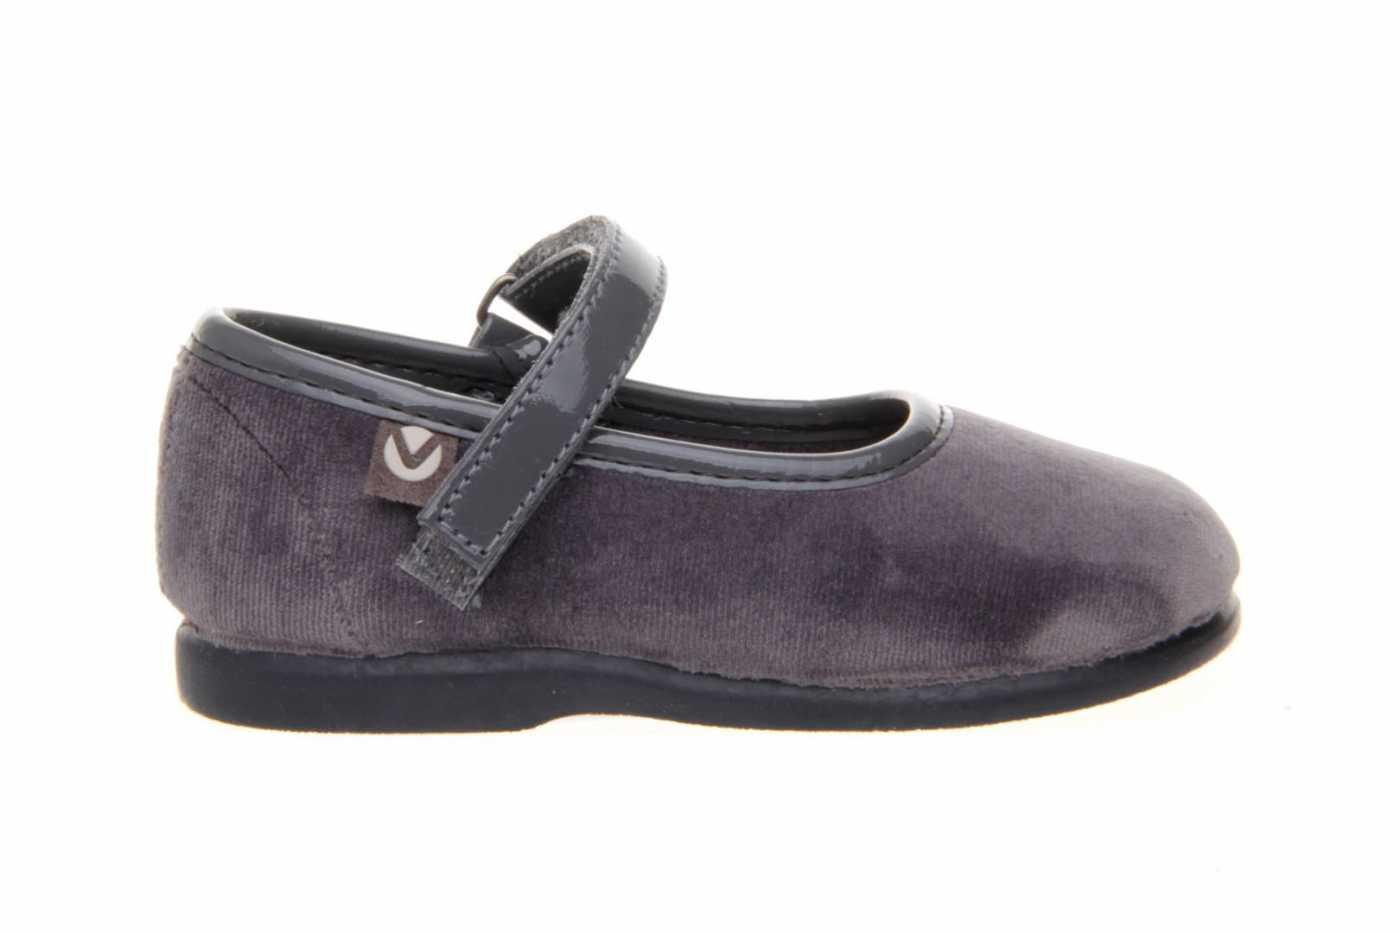 f061d21188ee2 Comprar zapato tipo PREANDANTE NIÑA estilo MERCEDES COLOR GRIS ...